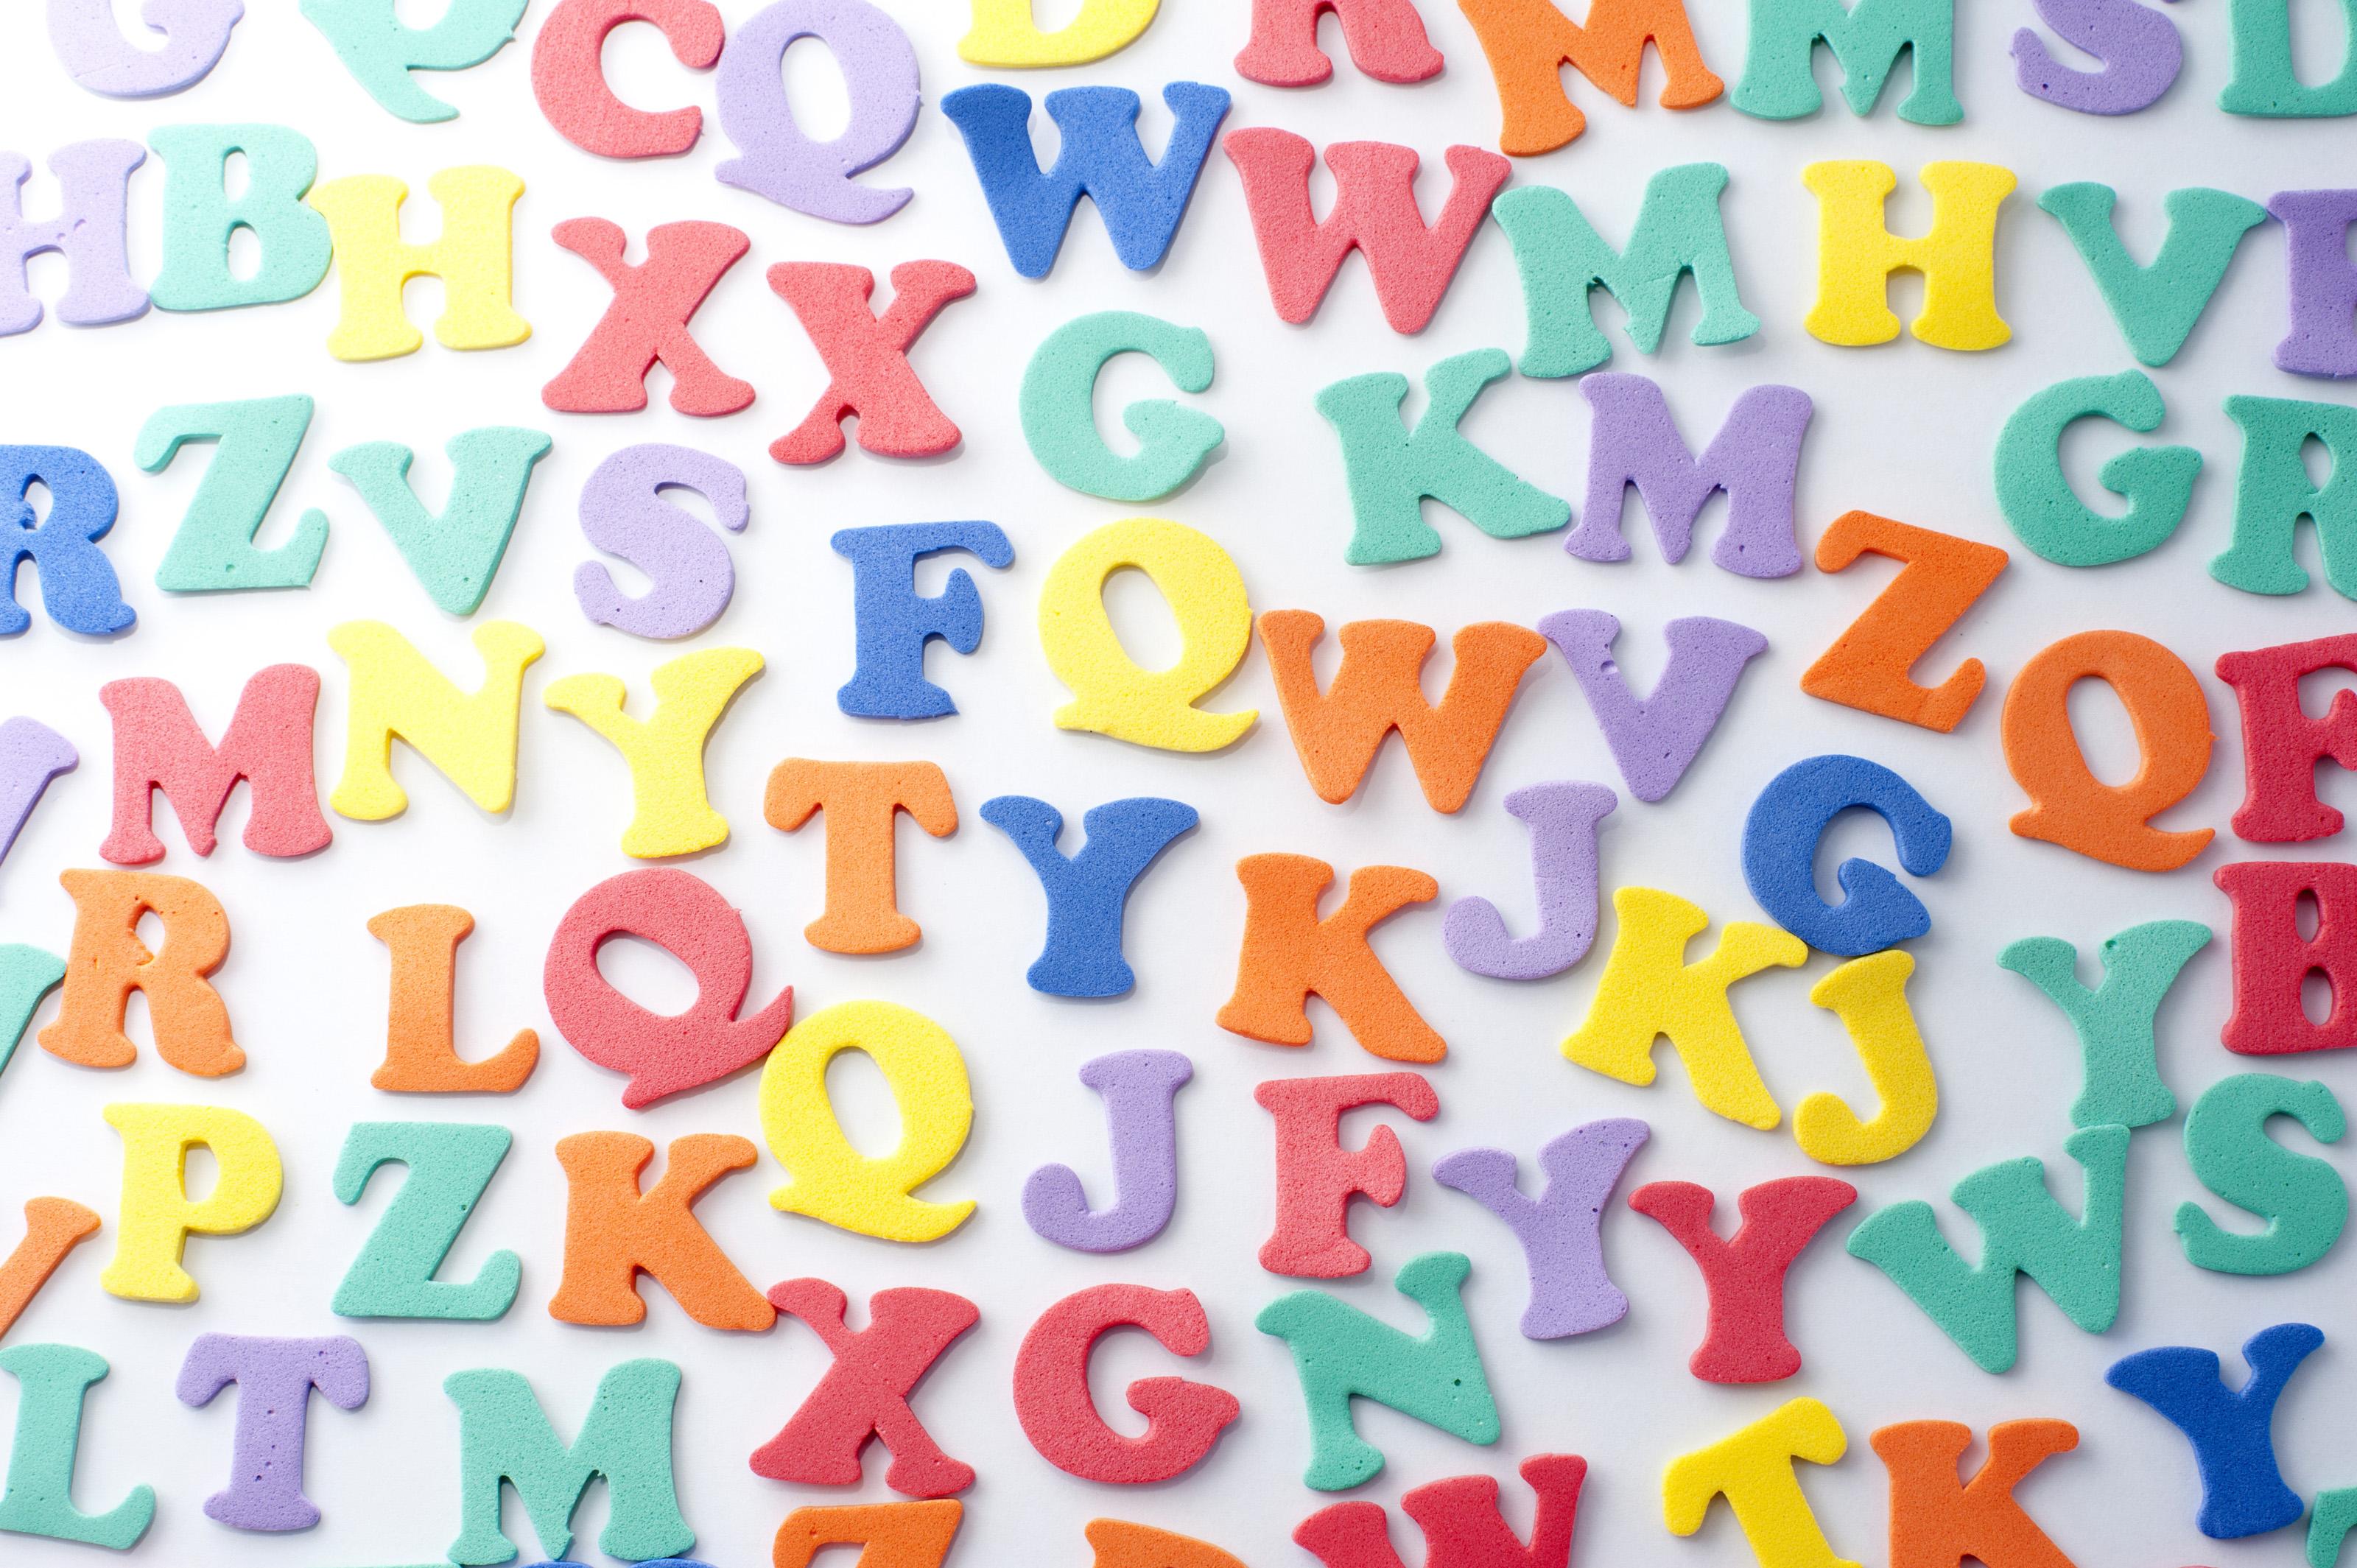 A Alphabet Wallpaper Freeware  Free Download A Alphabet